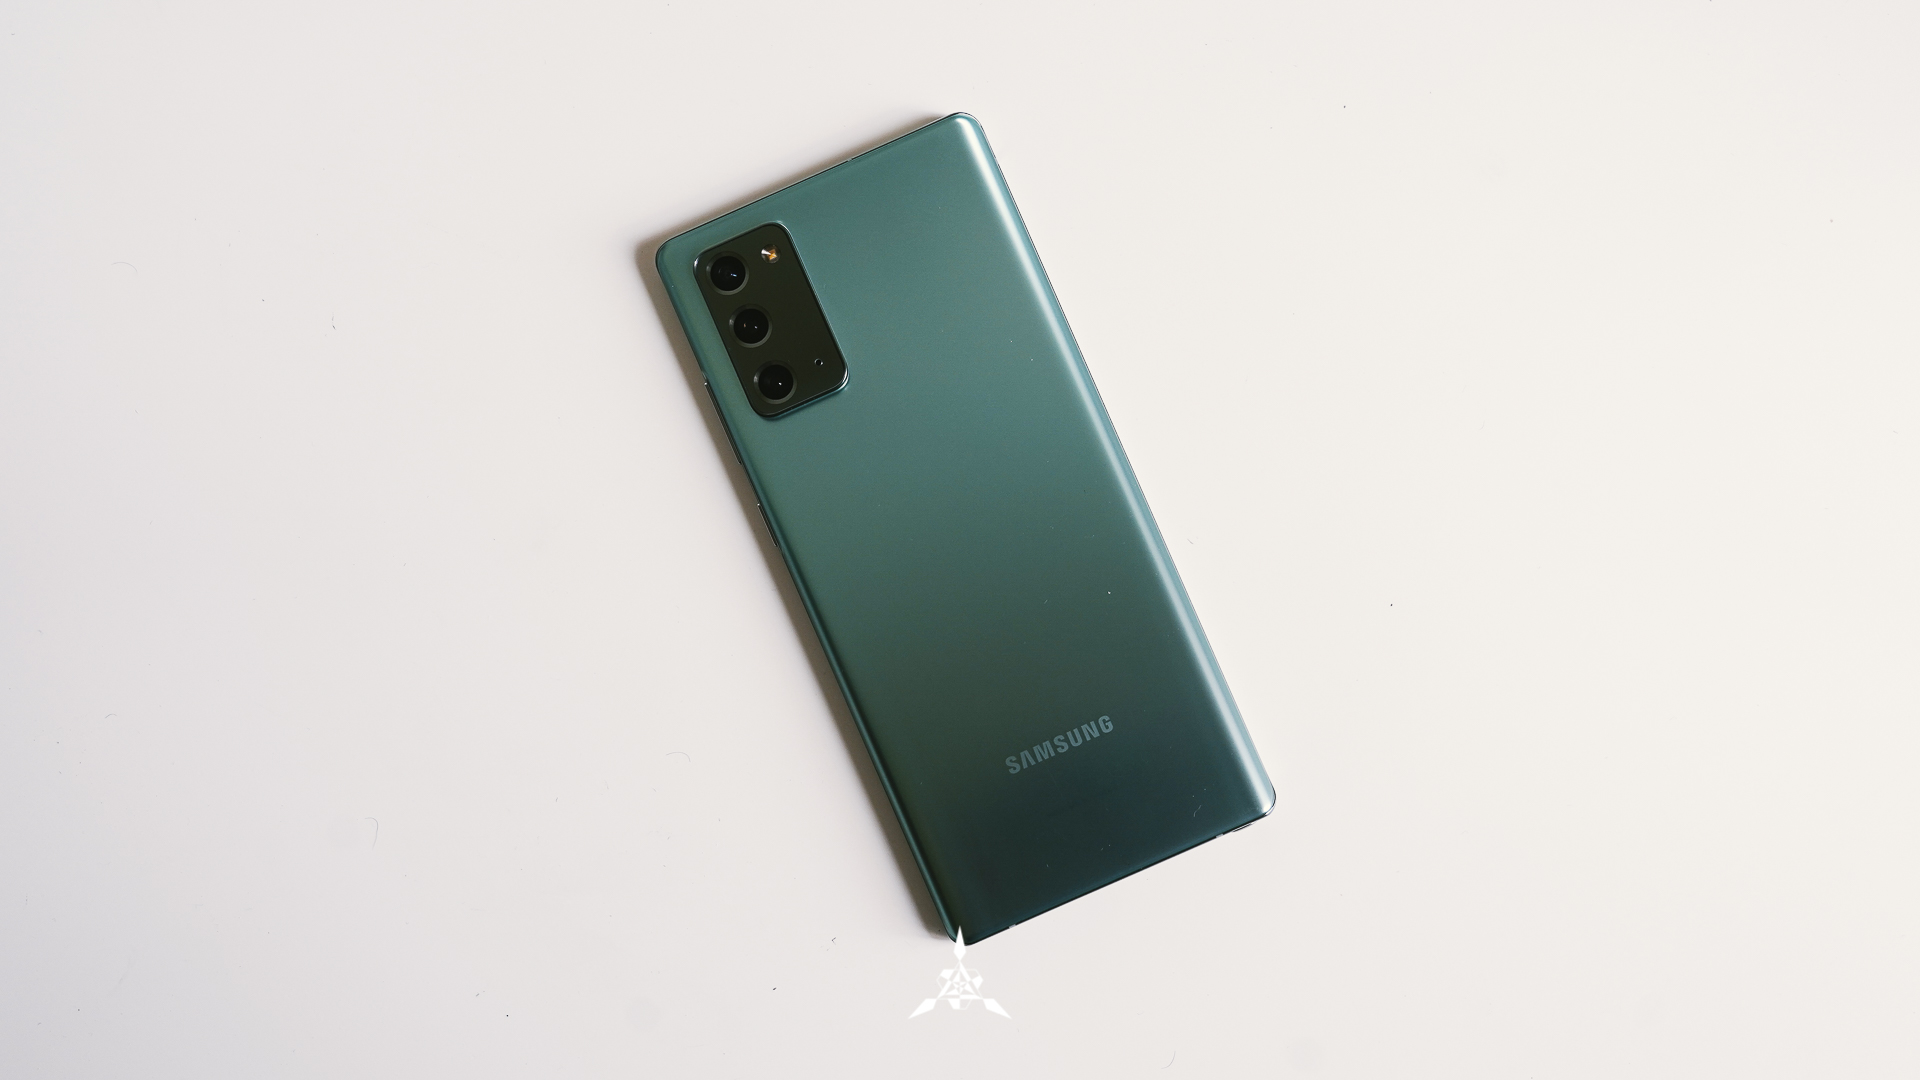 http://server.digimetriq.com/wp-content/uploads/2020/12/1607556491_887_Samsung-Galaxy-S20-FE-Review-We-Want-One.jpg